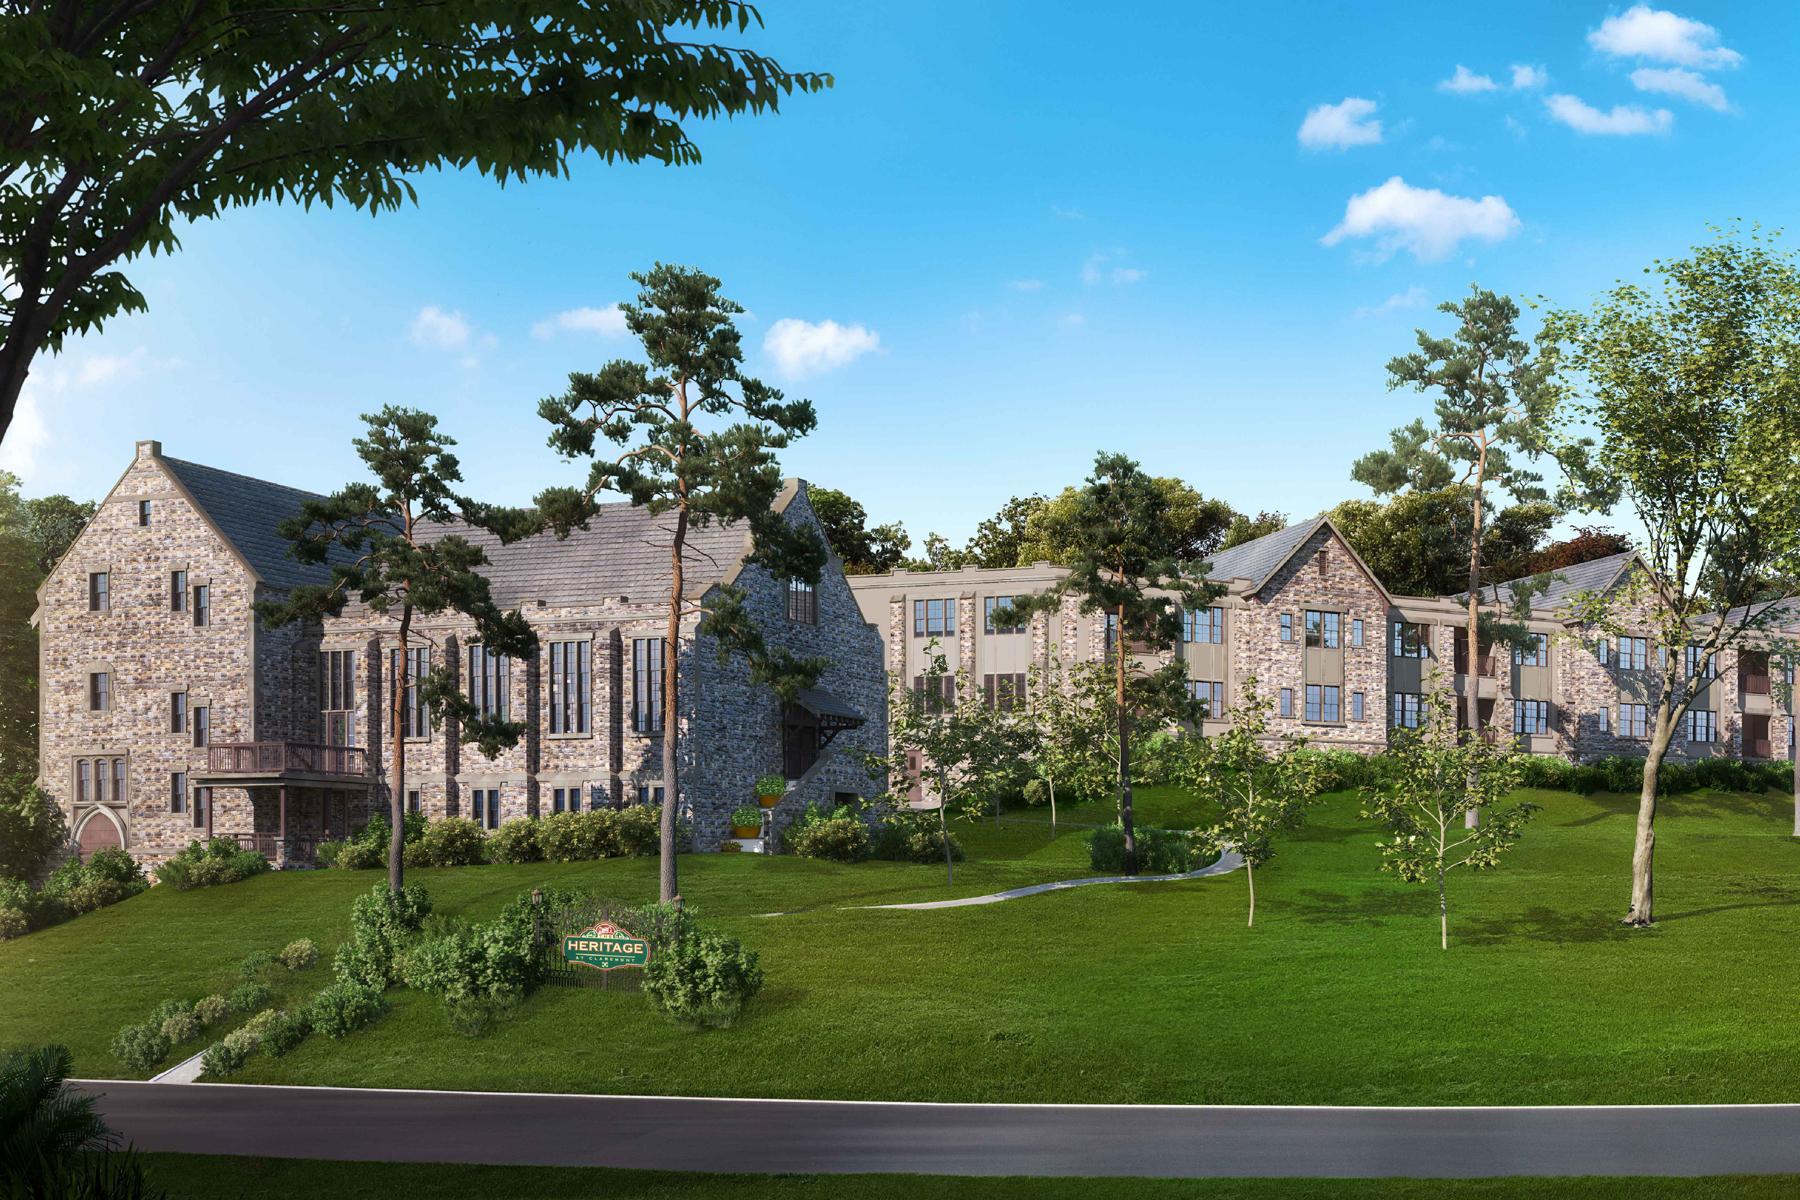 Condominiums للـ Sale في The Heritage at Claremont 80 Claremont Road, Residence 207, Bernardsville, New Jersey 07924 United States